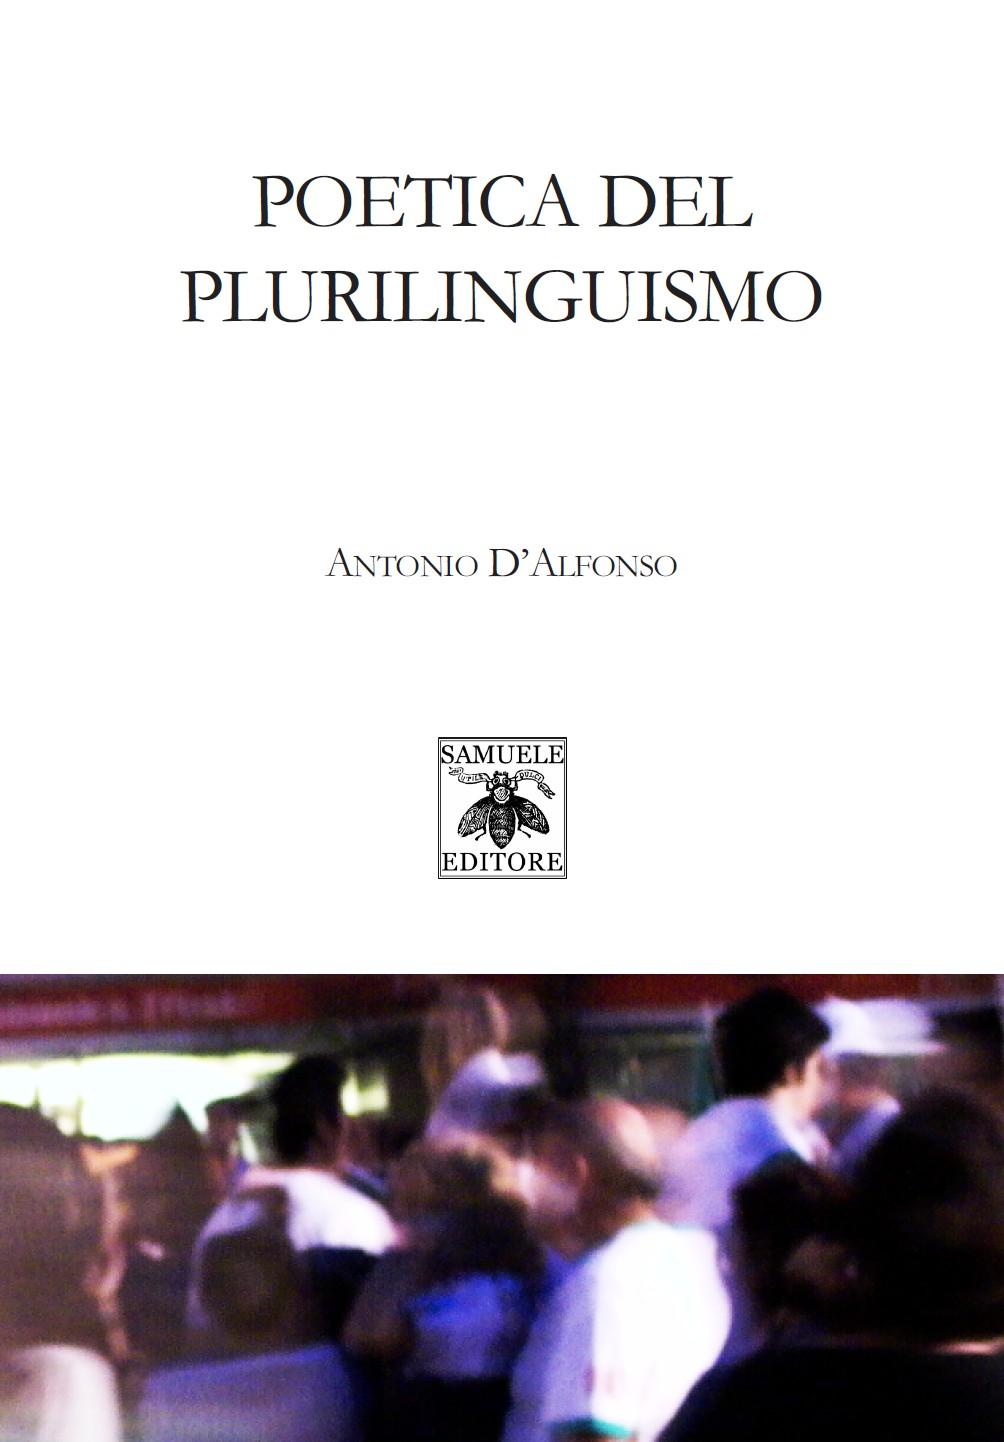 Poetica del plurilinguismo